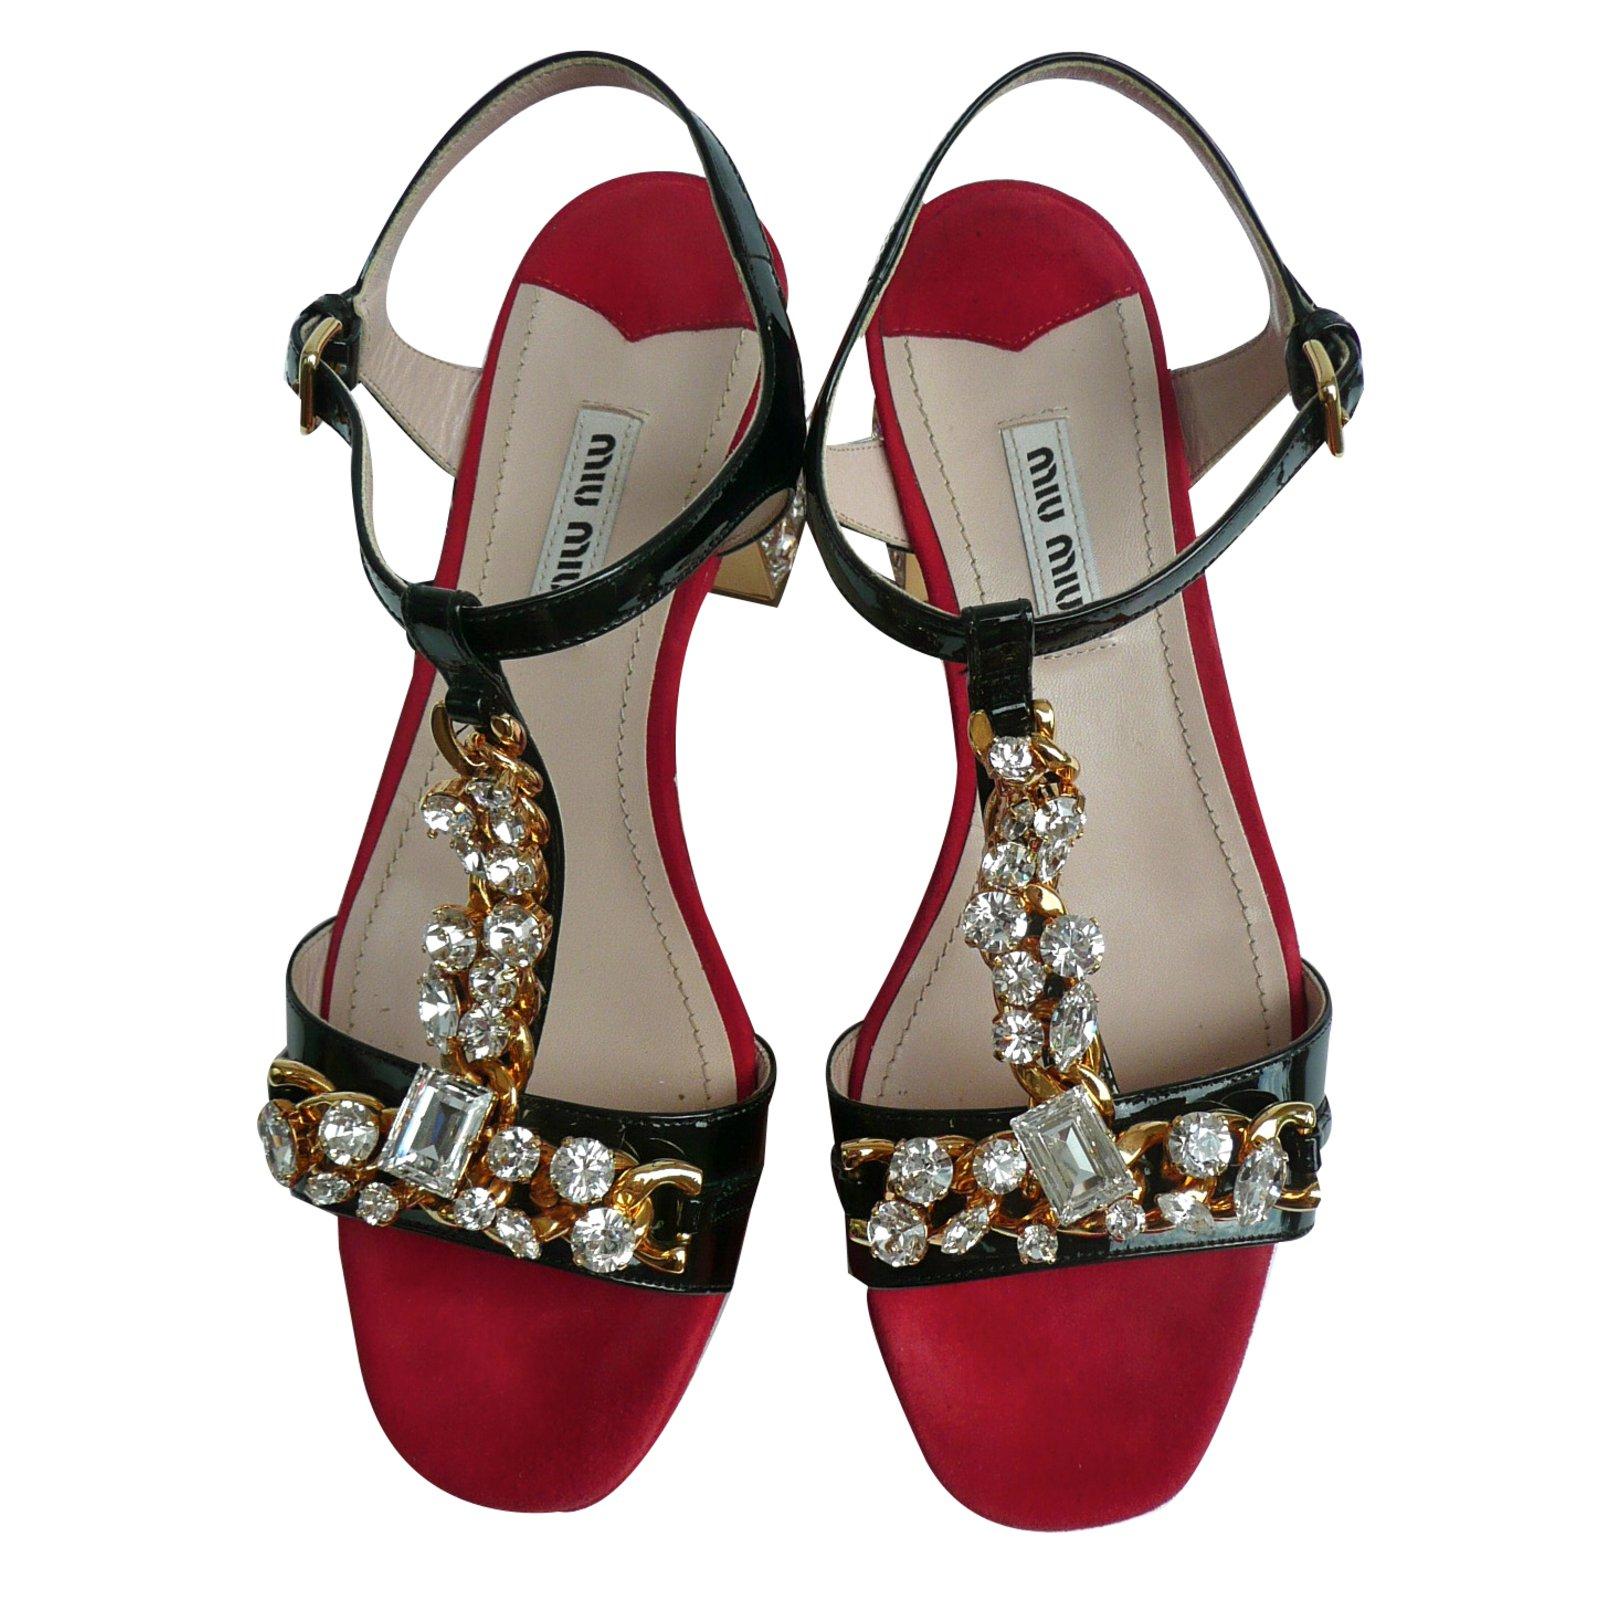 Sandales plates à fleursMiu Miu sRMck